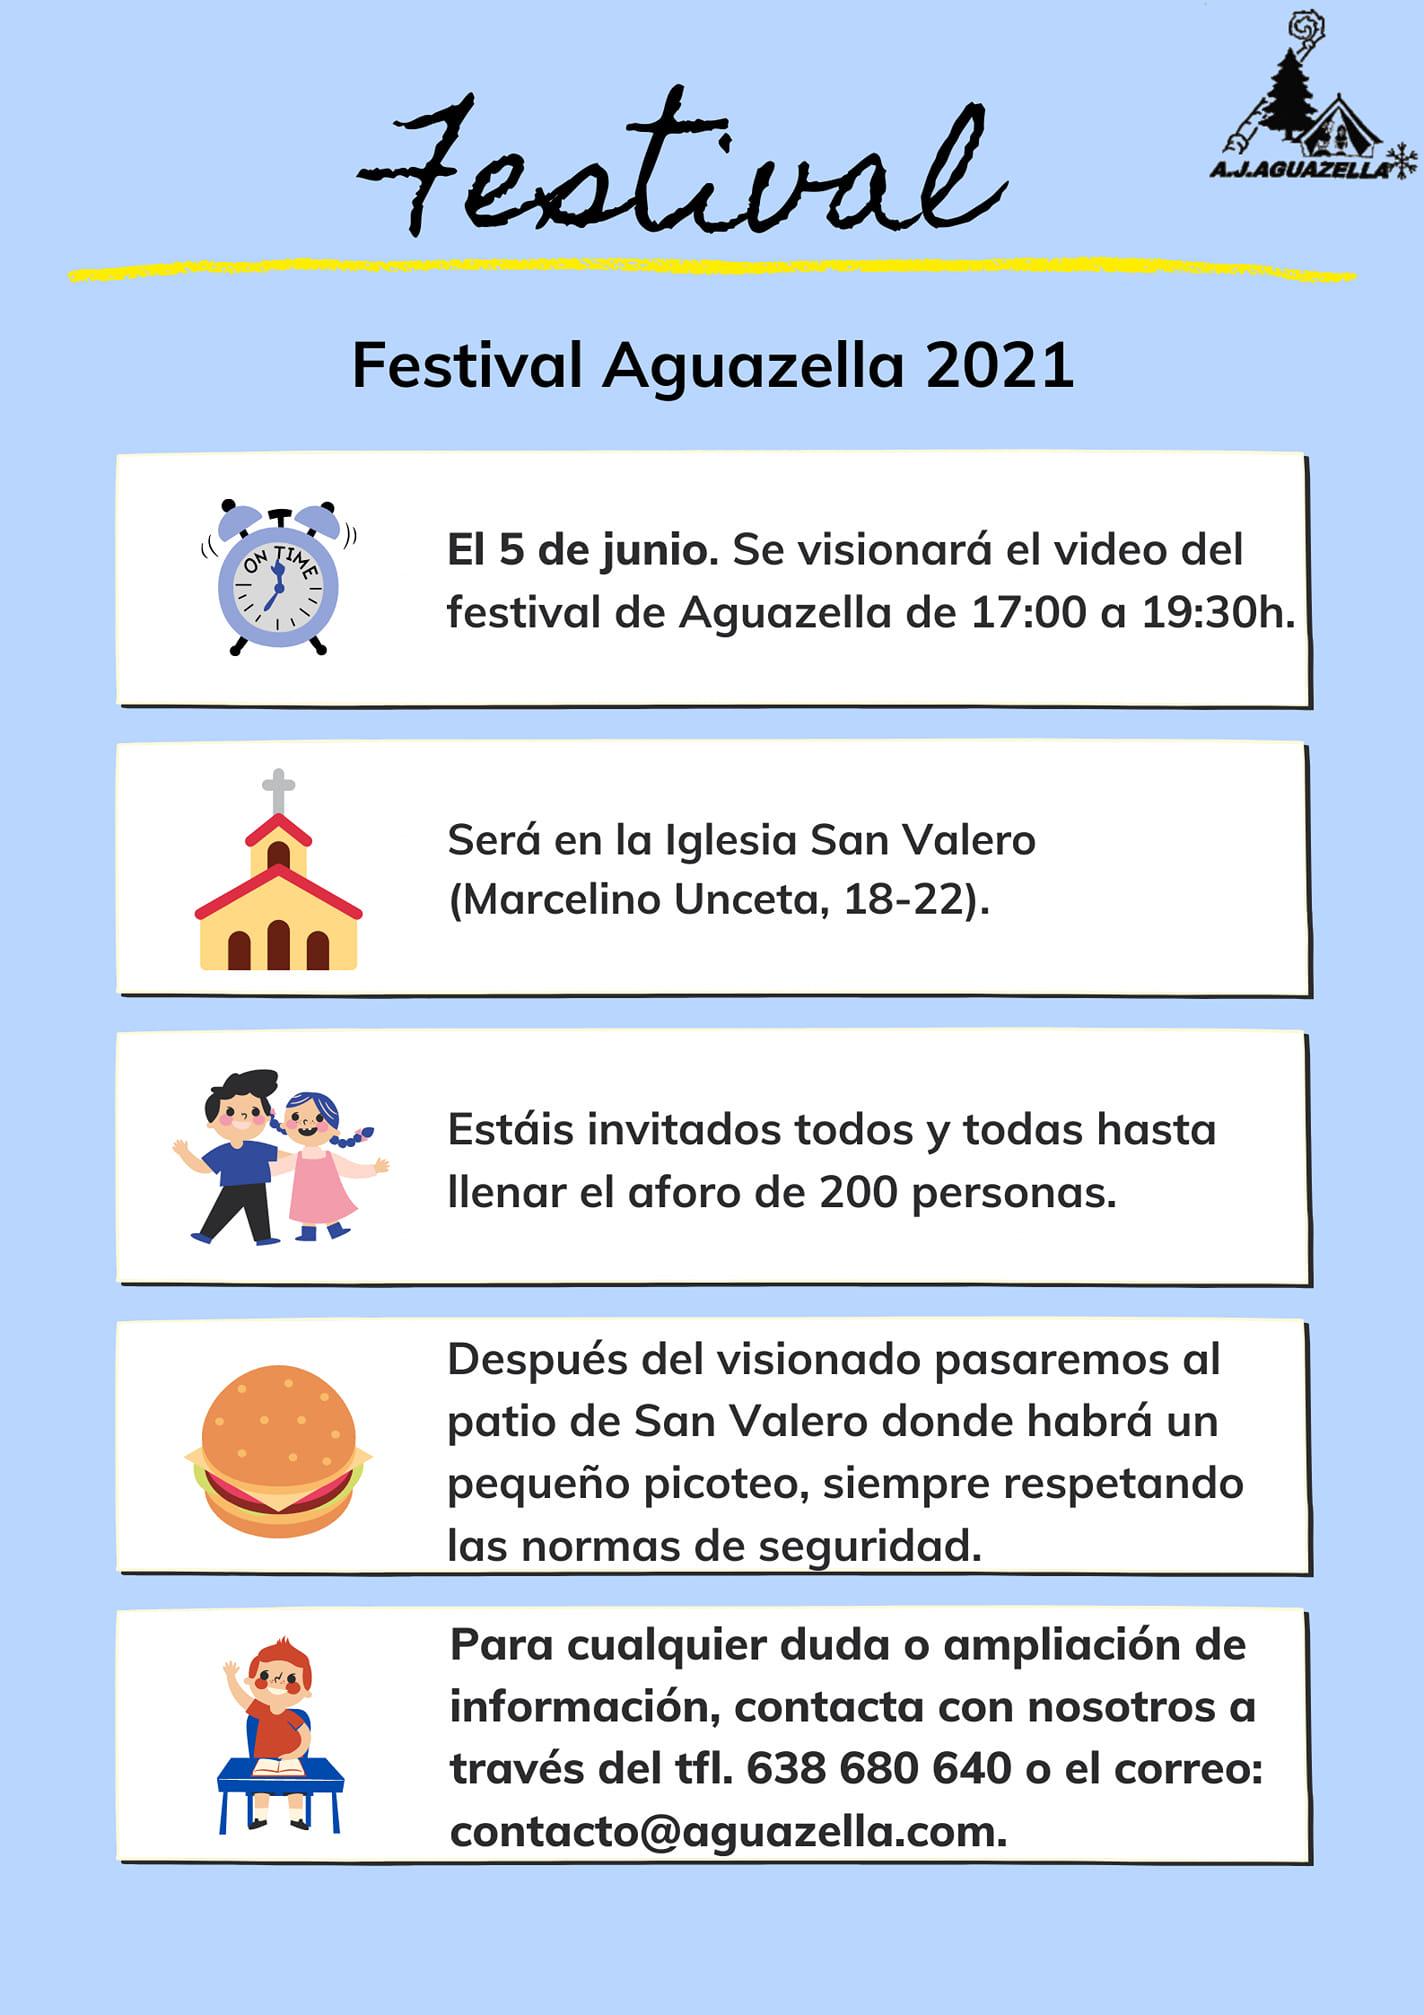 Festival Aguazella 2021